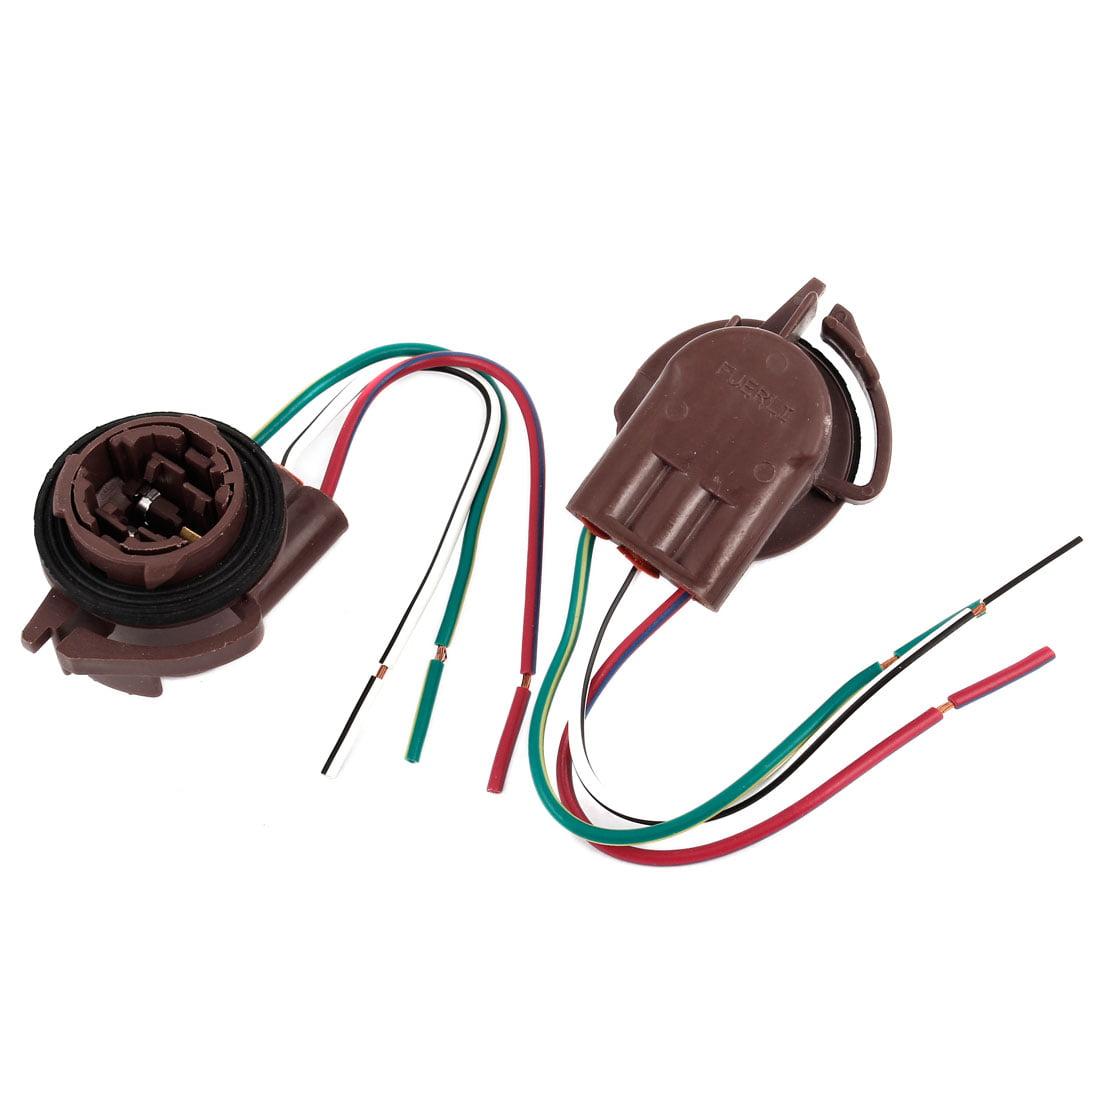 2 Pcs Auto Car Brown Plastic Water Resist 3157 Type Turn Signal Light Socket - image 1 de 1